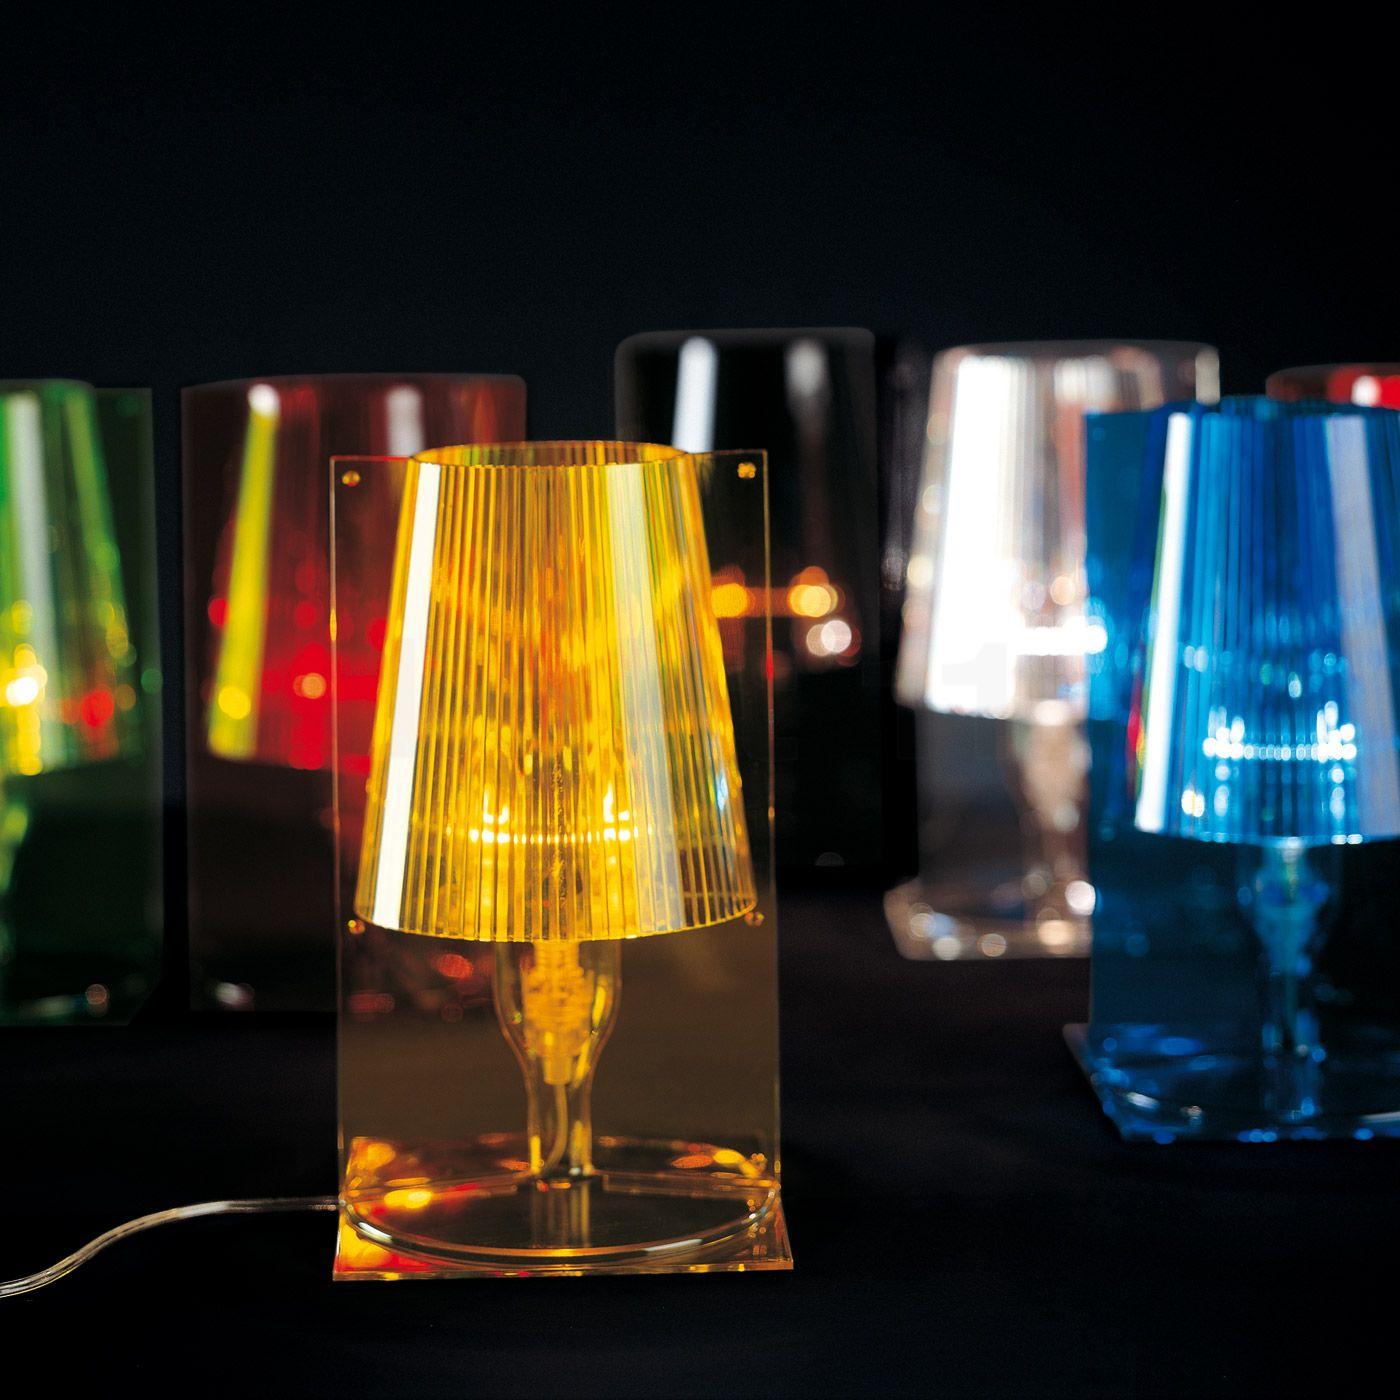 Kartell Take kaufen bei light11.de